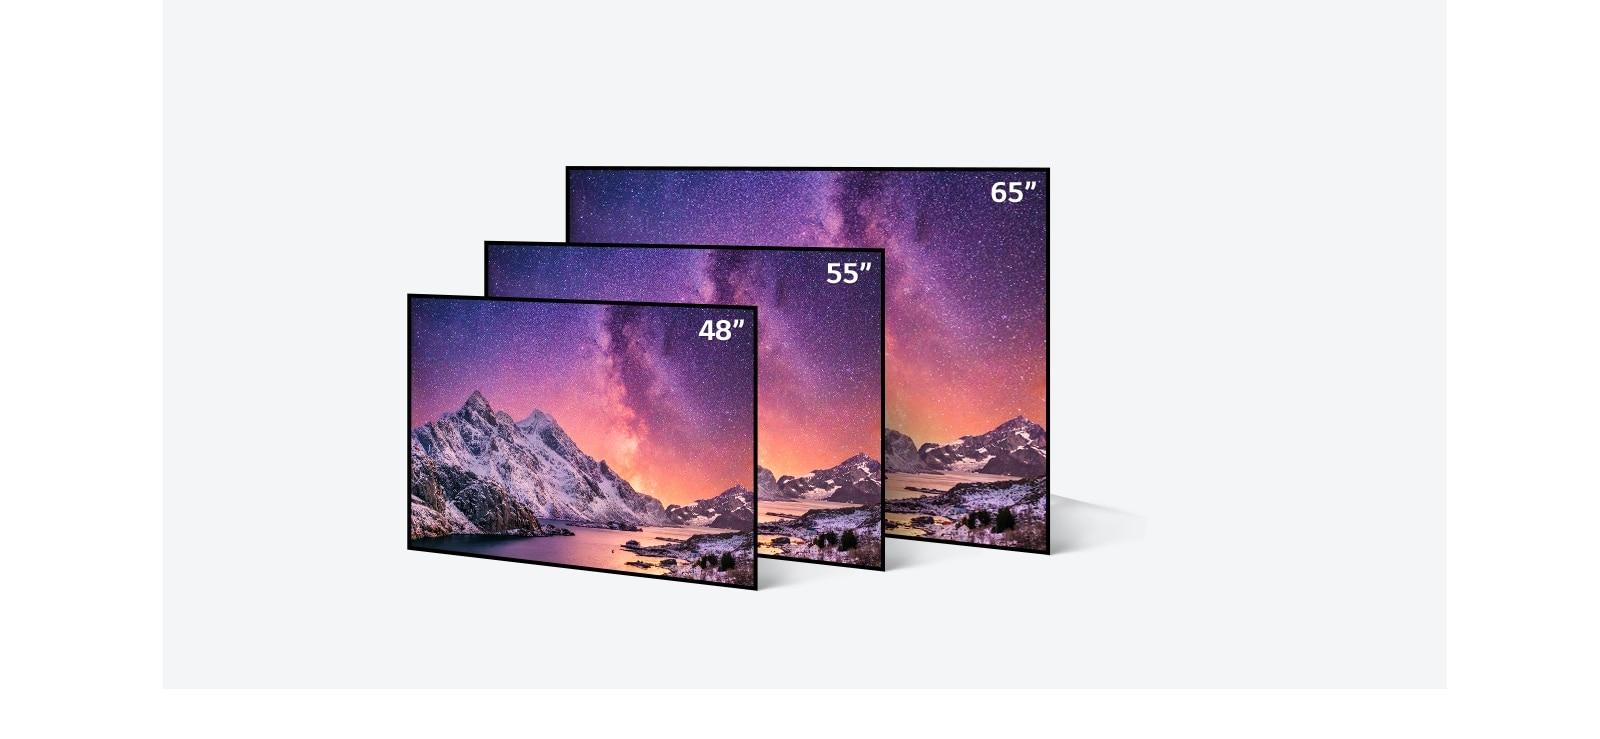 LG OLED 電視機身尺寸繁多(由 48 寸到 65 寸)